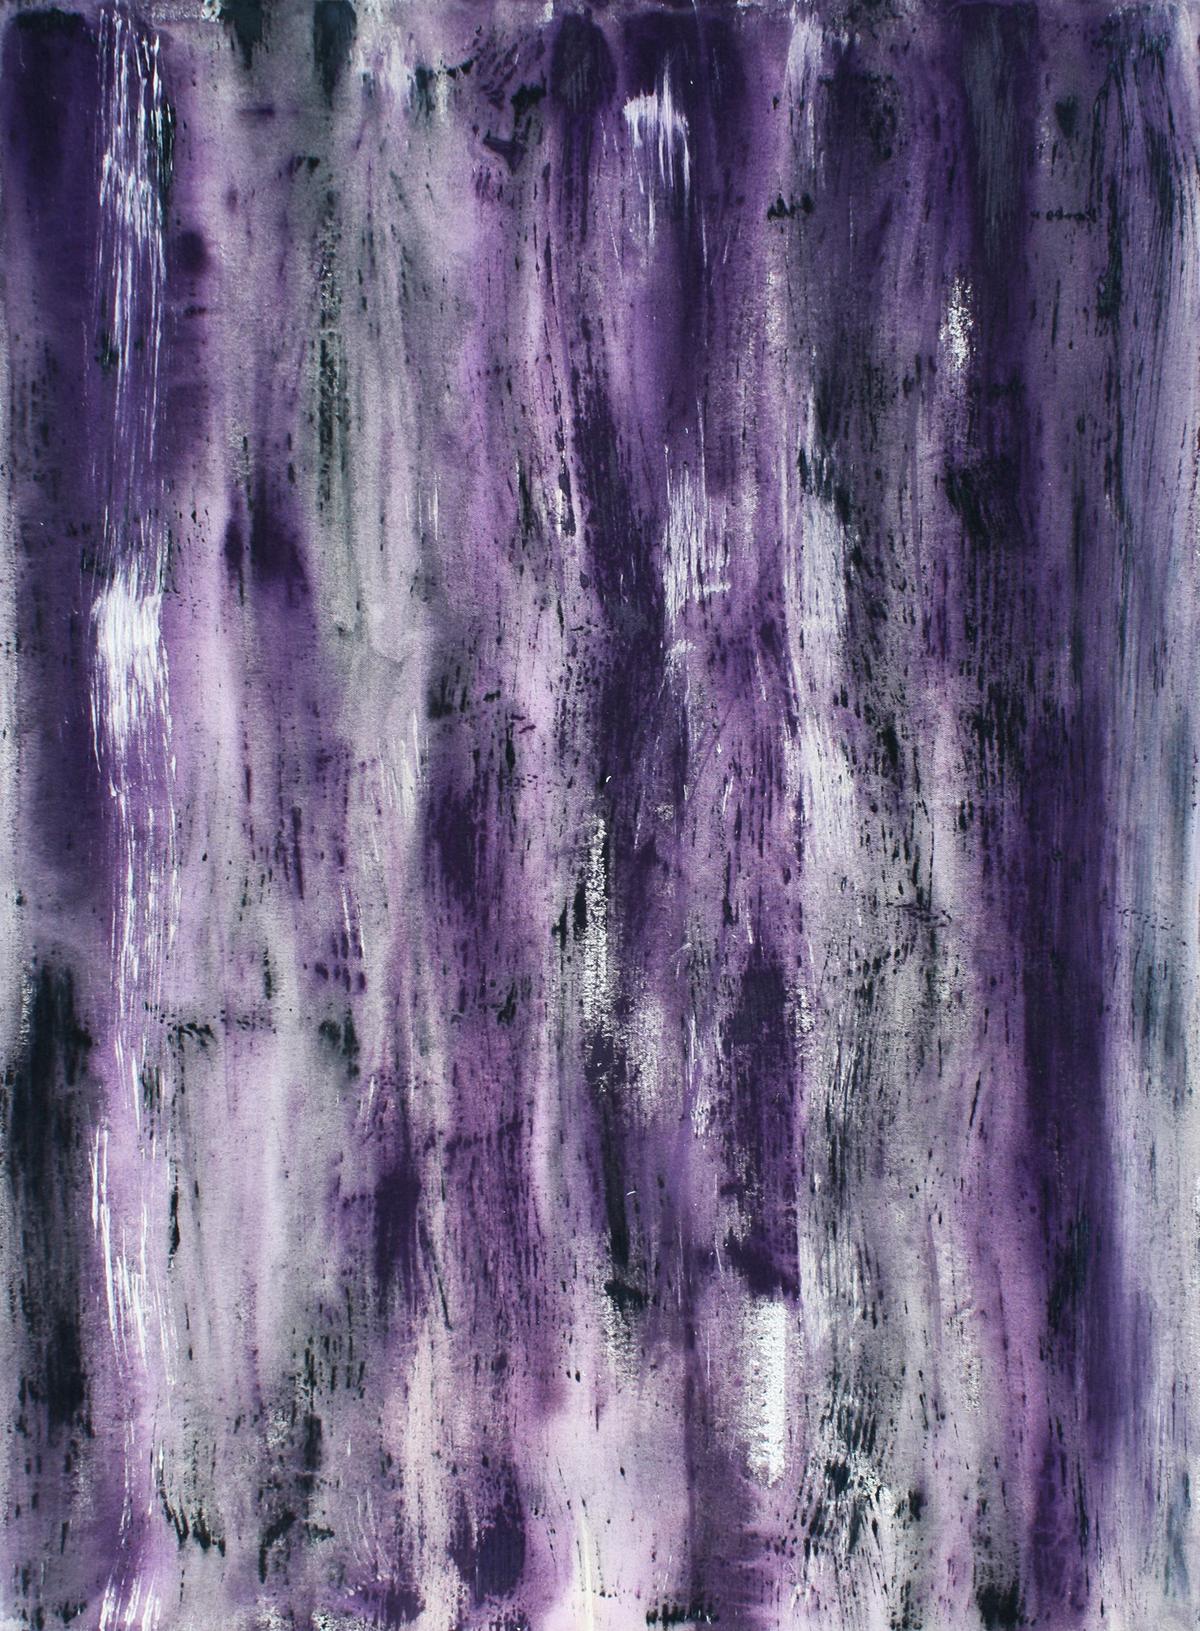 Purple and White Study